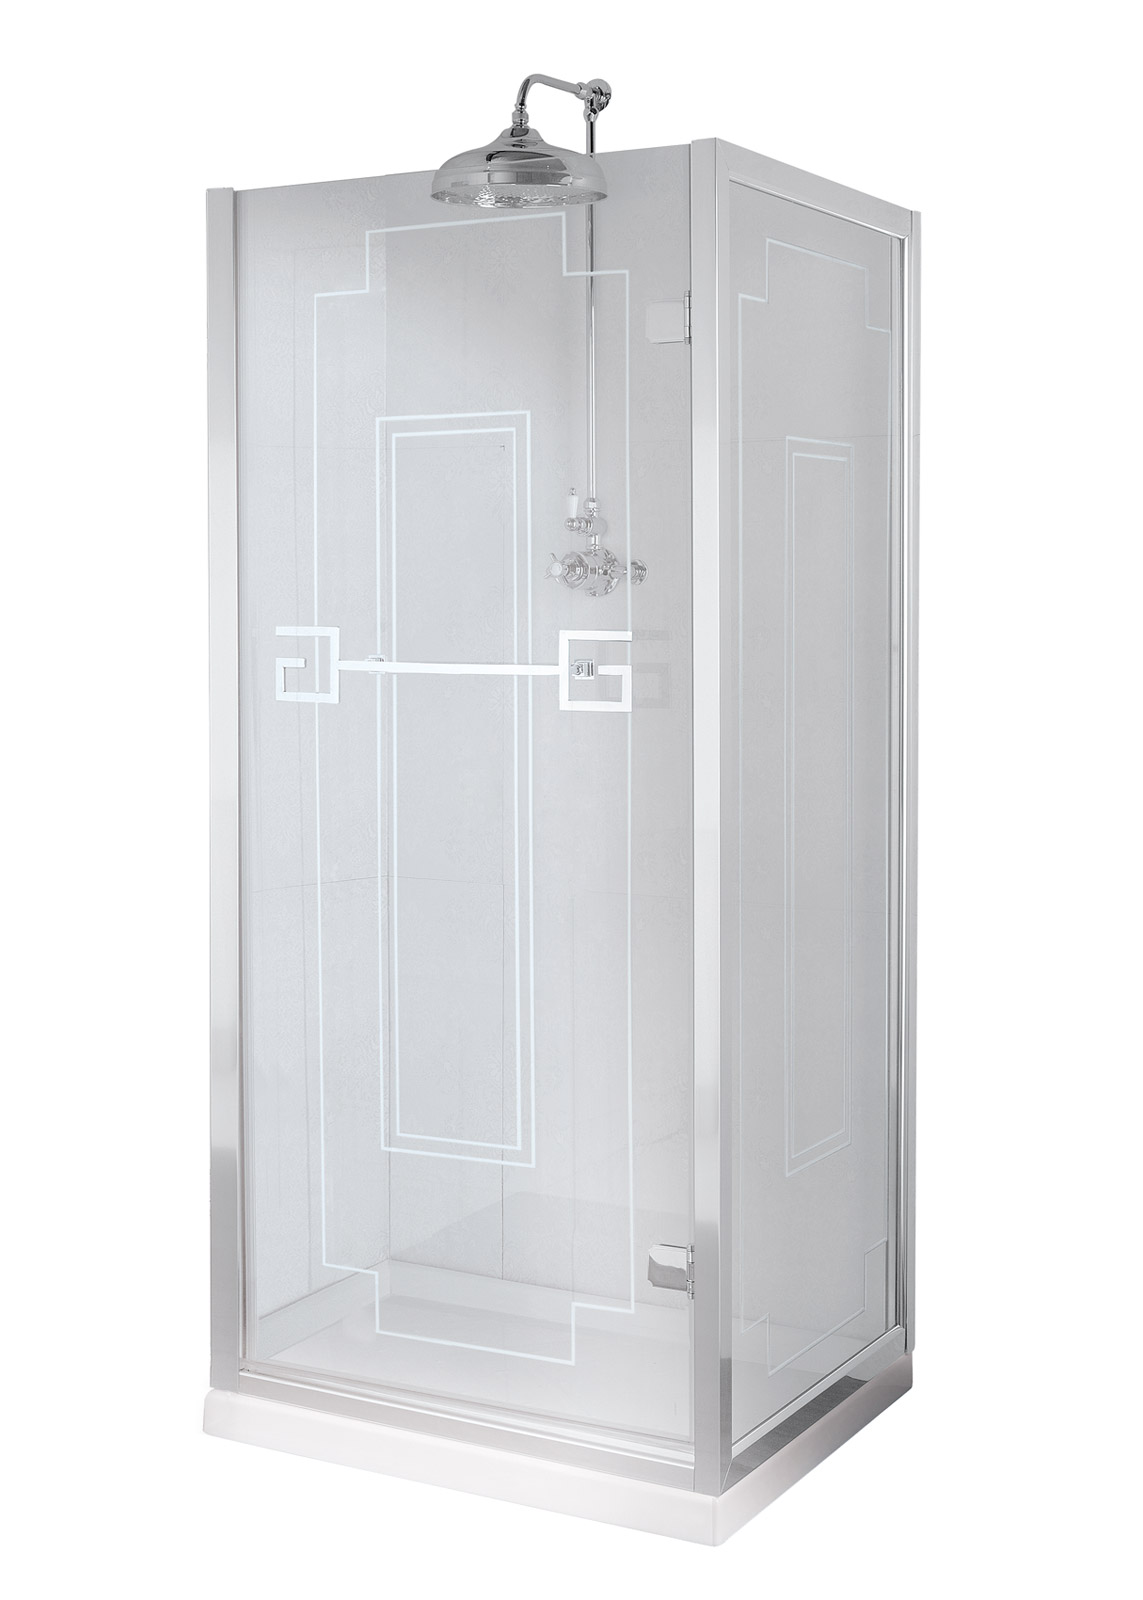 Shower enclosures Gentry Home